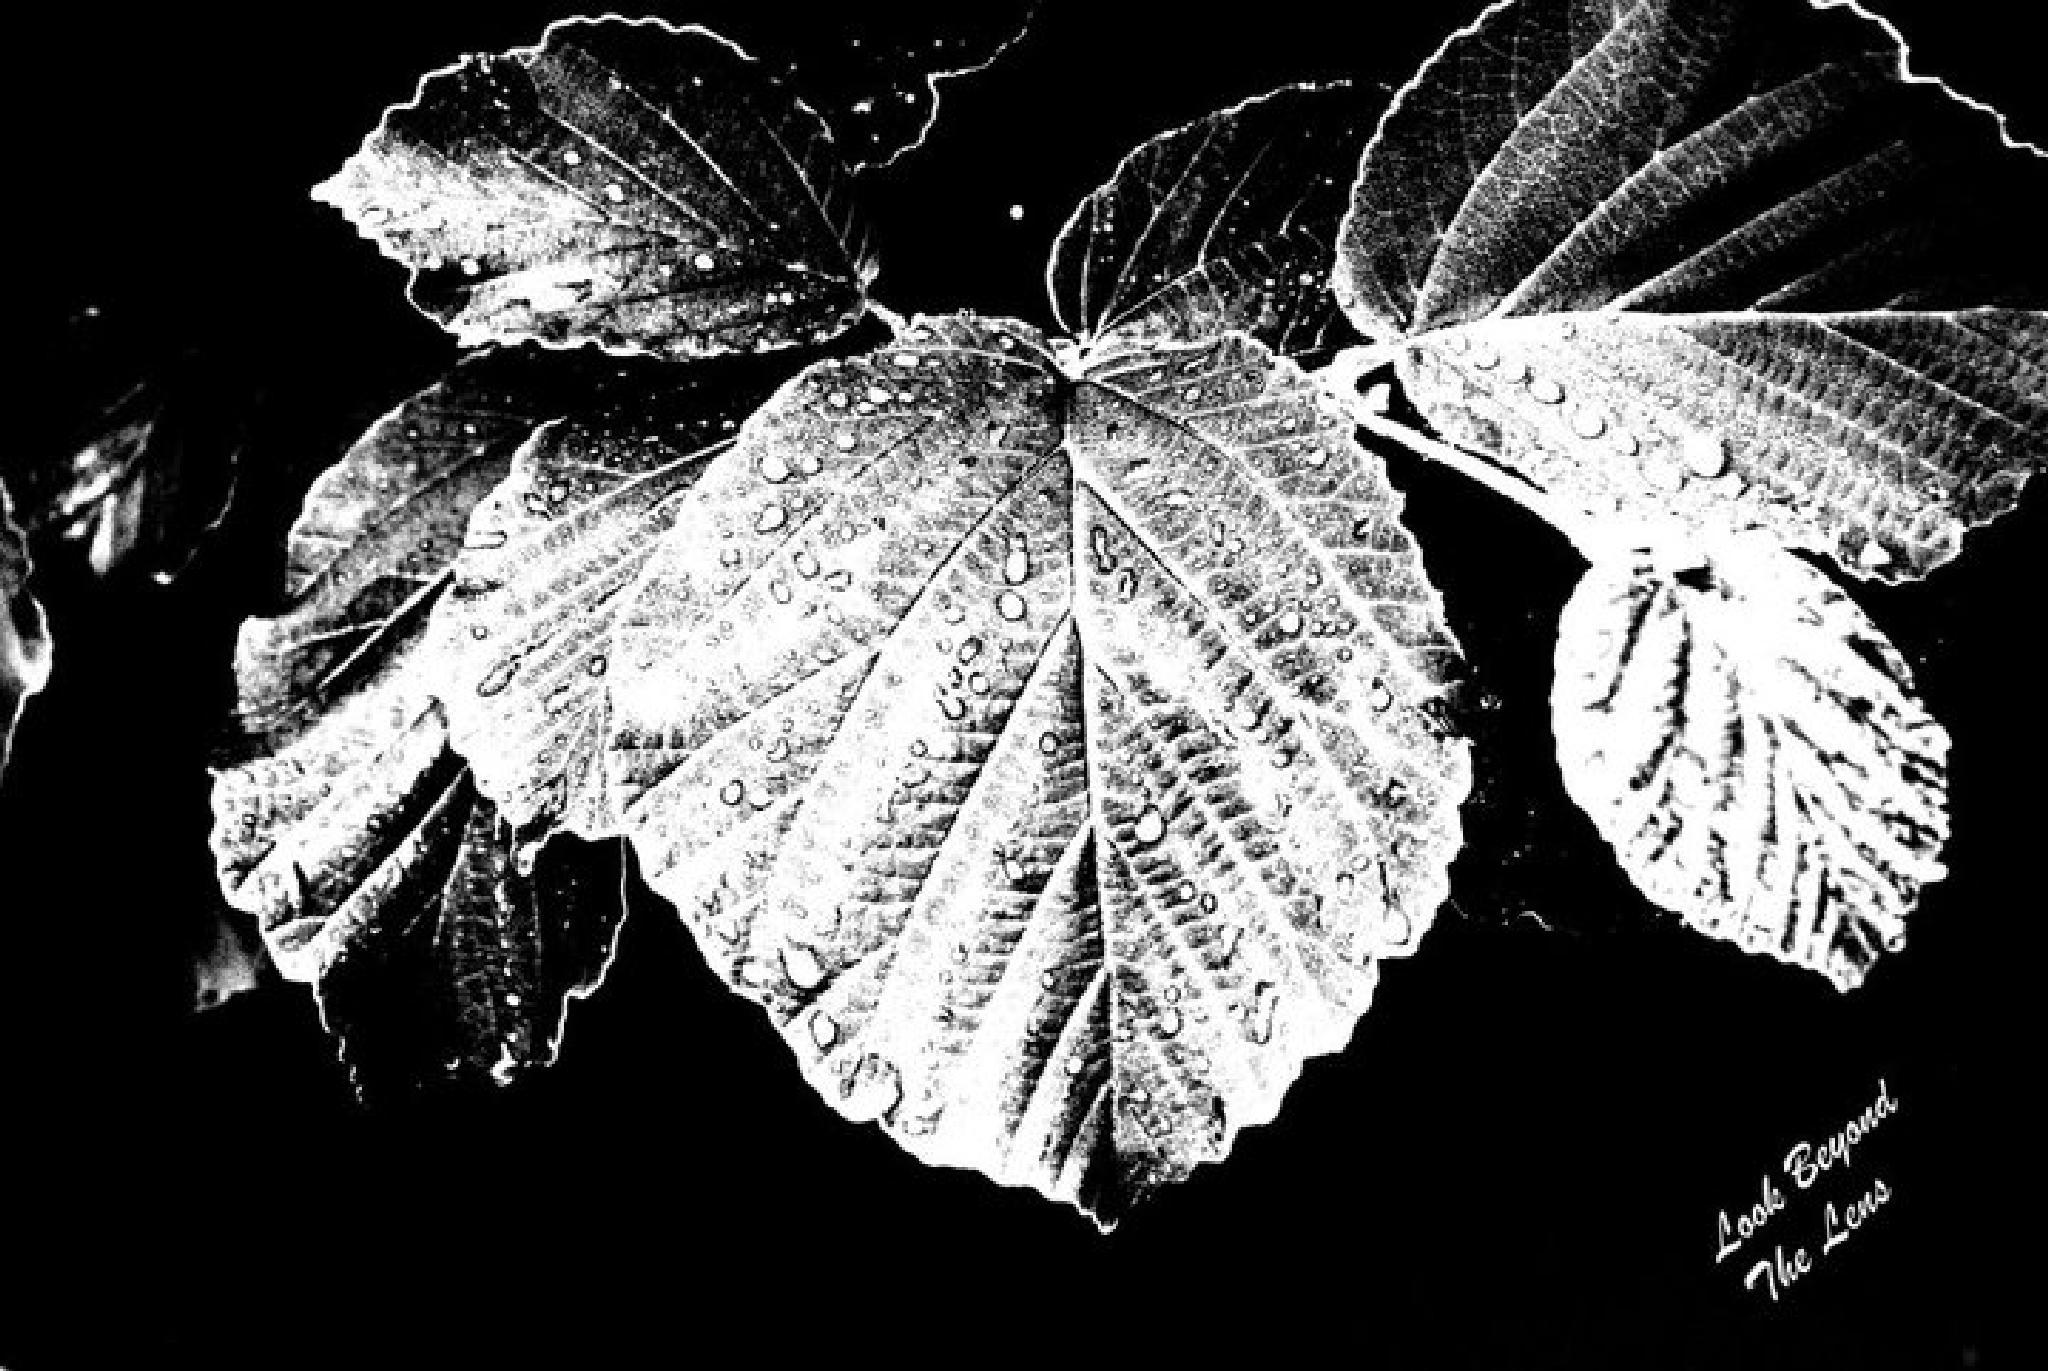 damp leaves by sunshinerjw1